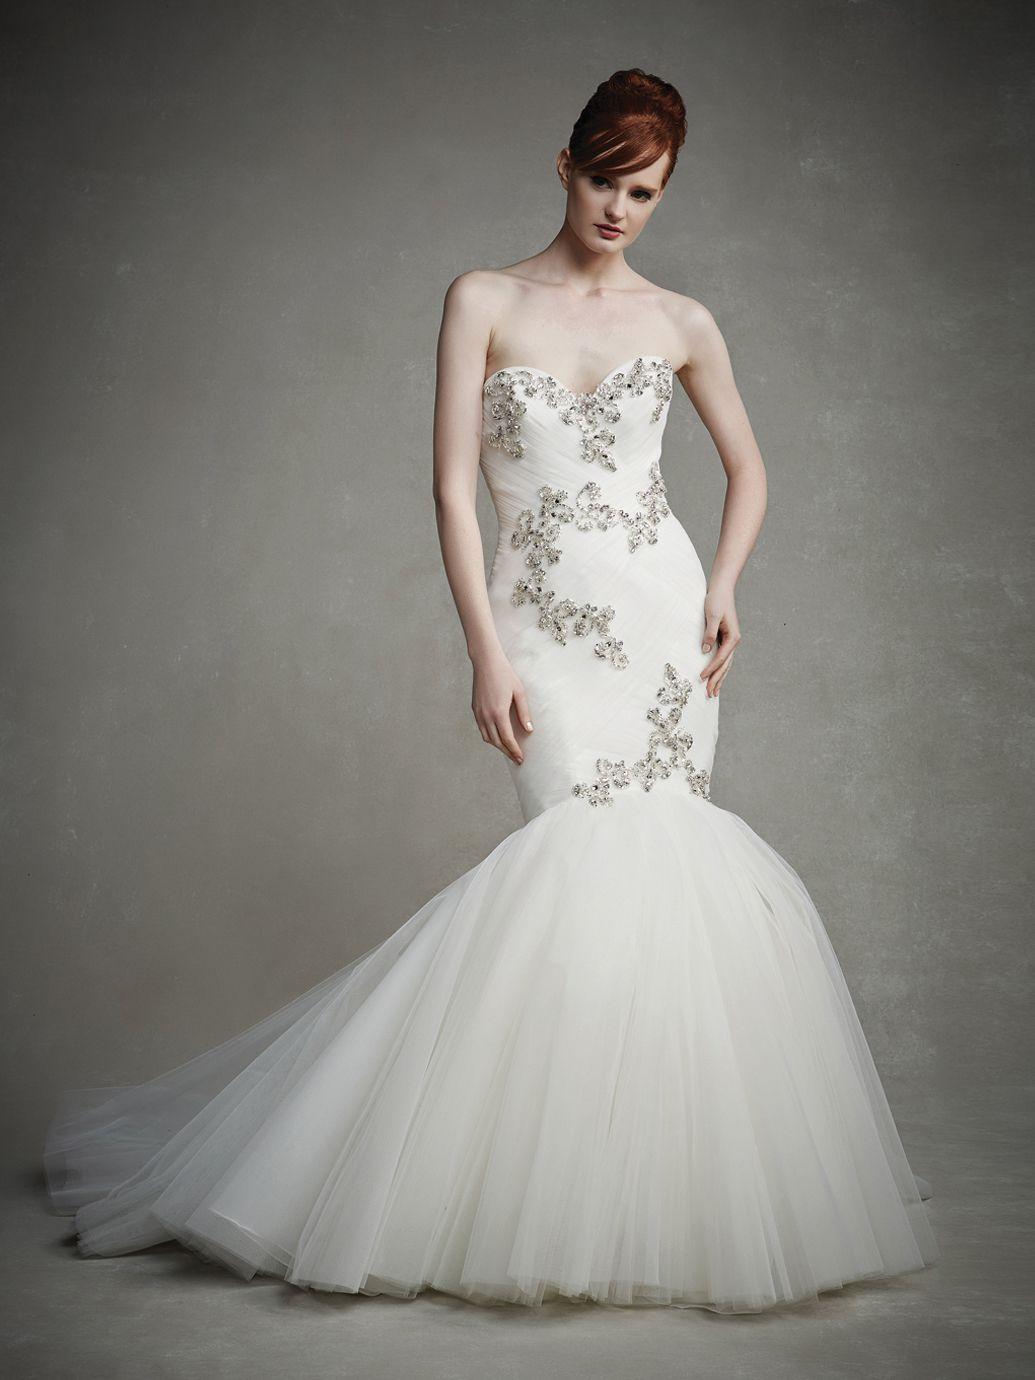 Tulle mermaid wedding dress  An ultrachic flare tulle mermaid skirt creates a beautiful